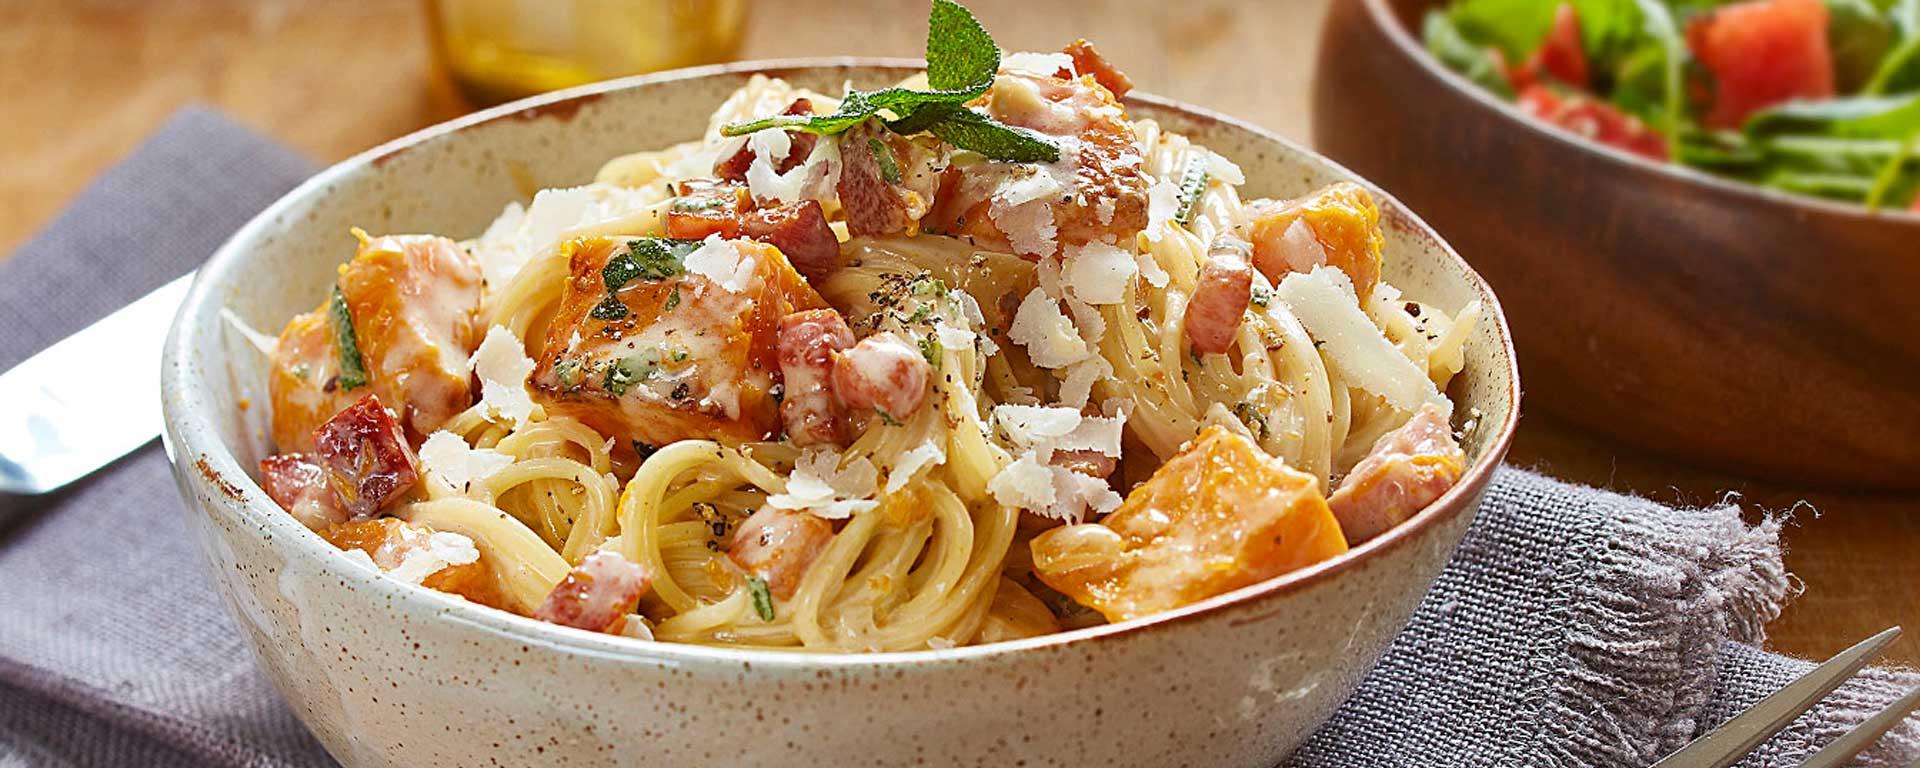 Photo for - Smokey Bacon, Squash and Sage Pasta